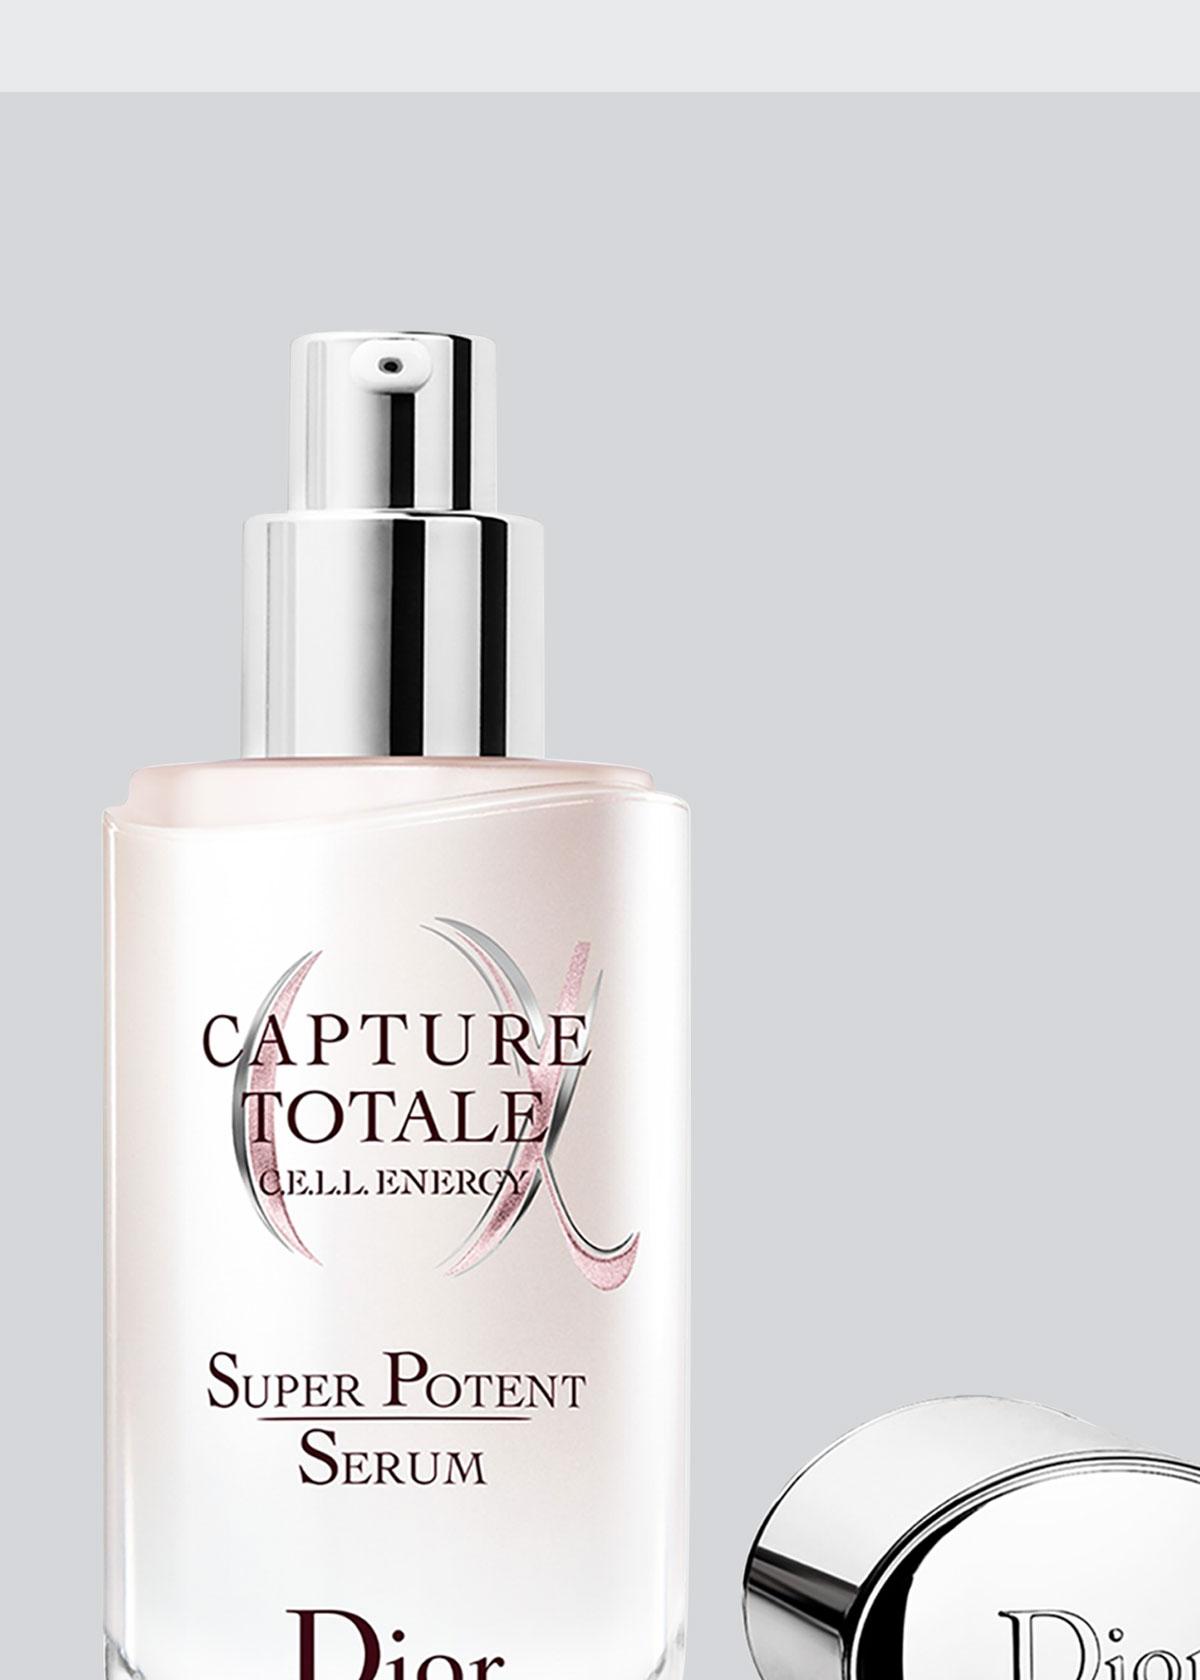 Dior CAPTURE TOTALE C.E.L.L. ENERGY SUPER POTENT AGE-DEFYING INTENSE SERUM, 1.0 OZ. / 30 ML